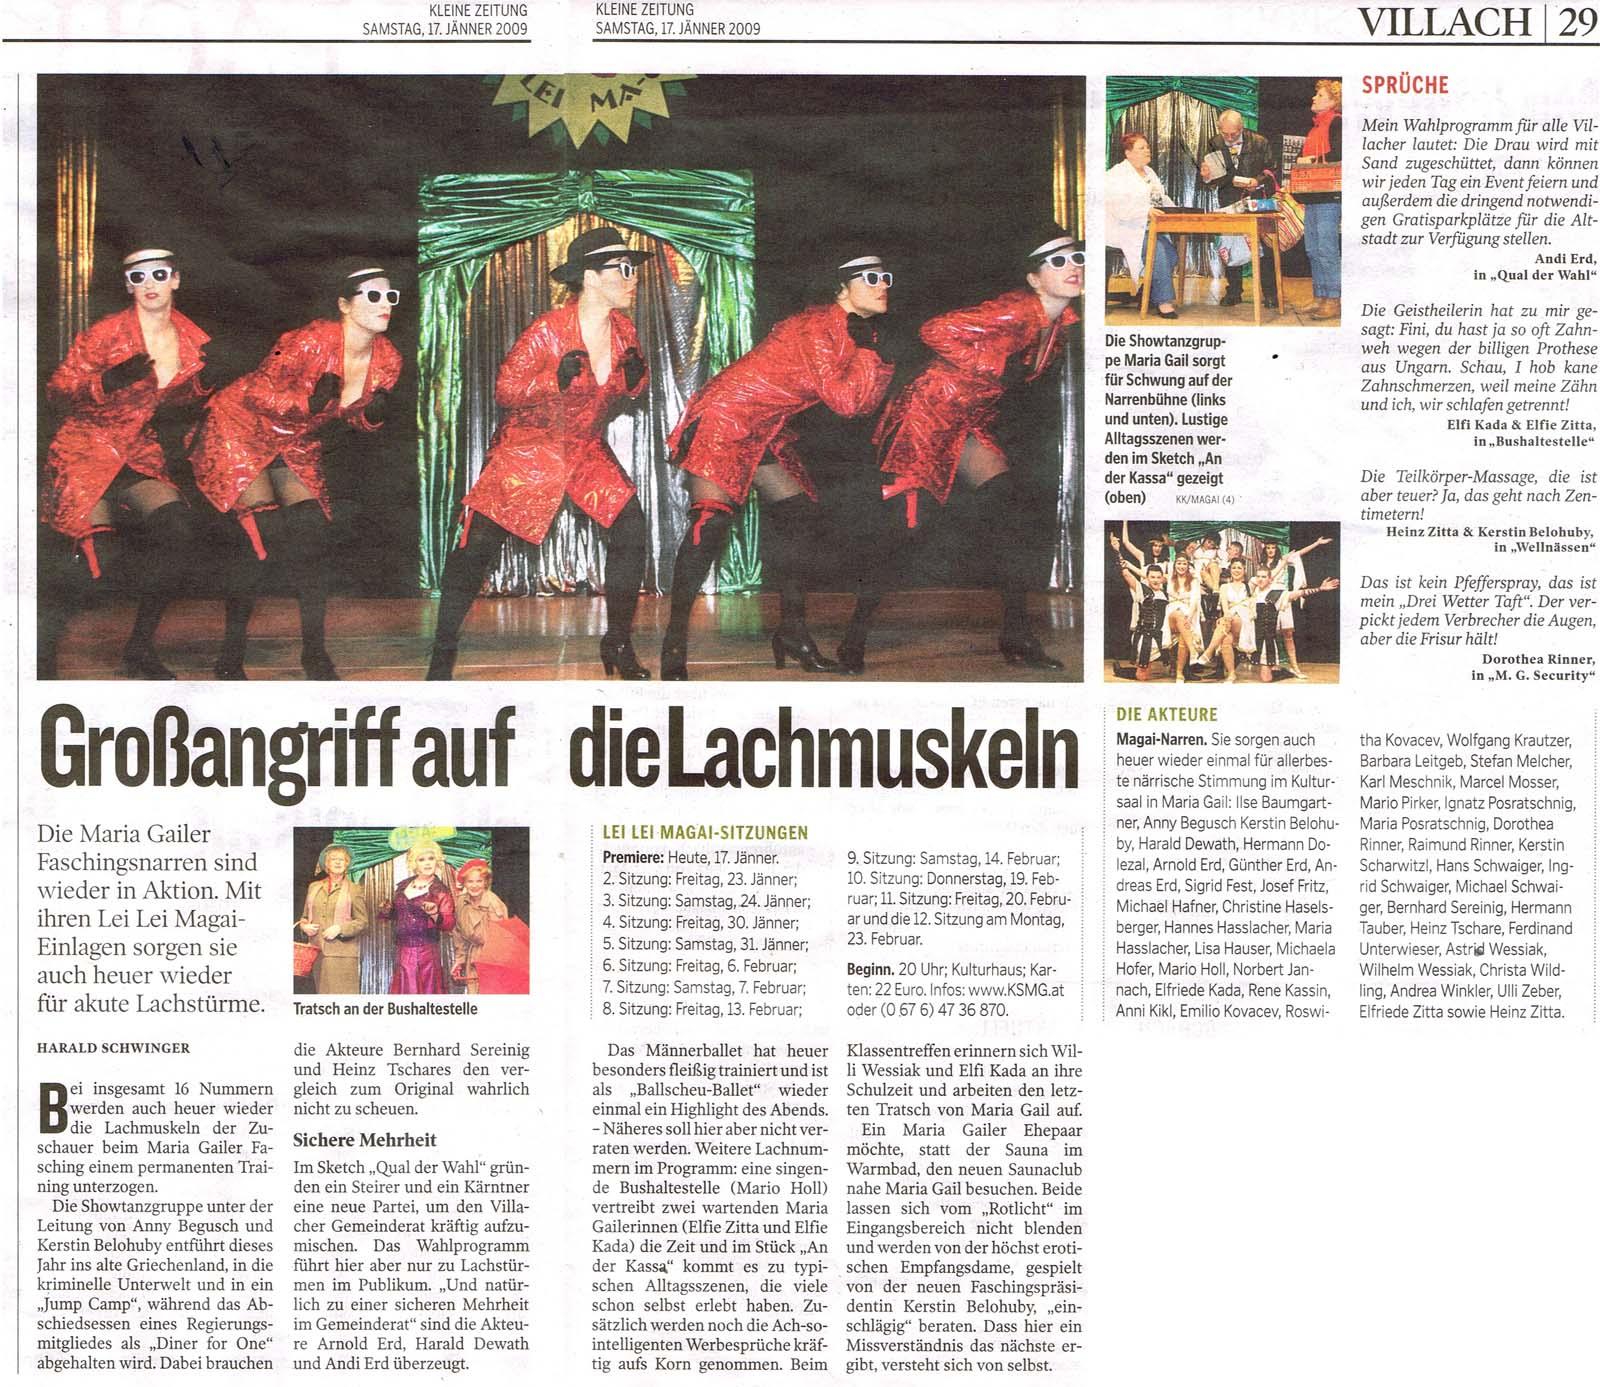 Fasching 2009 Presse3